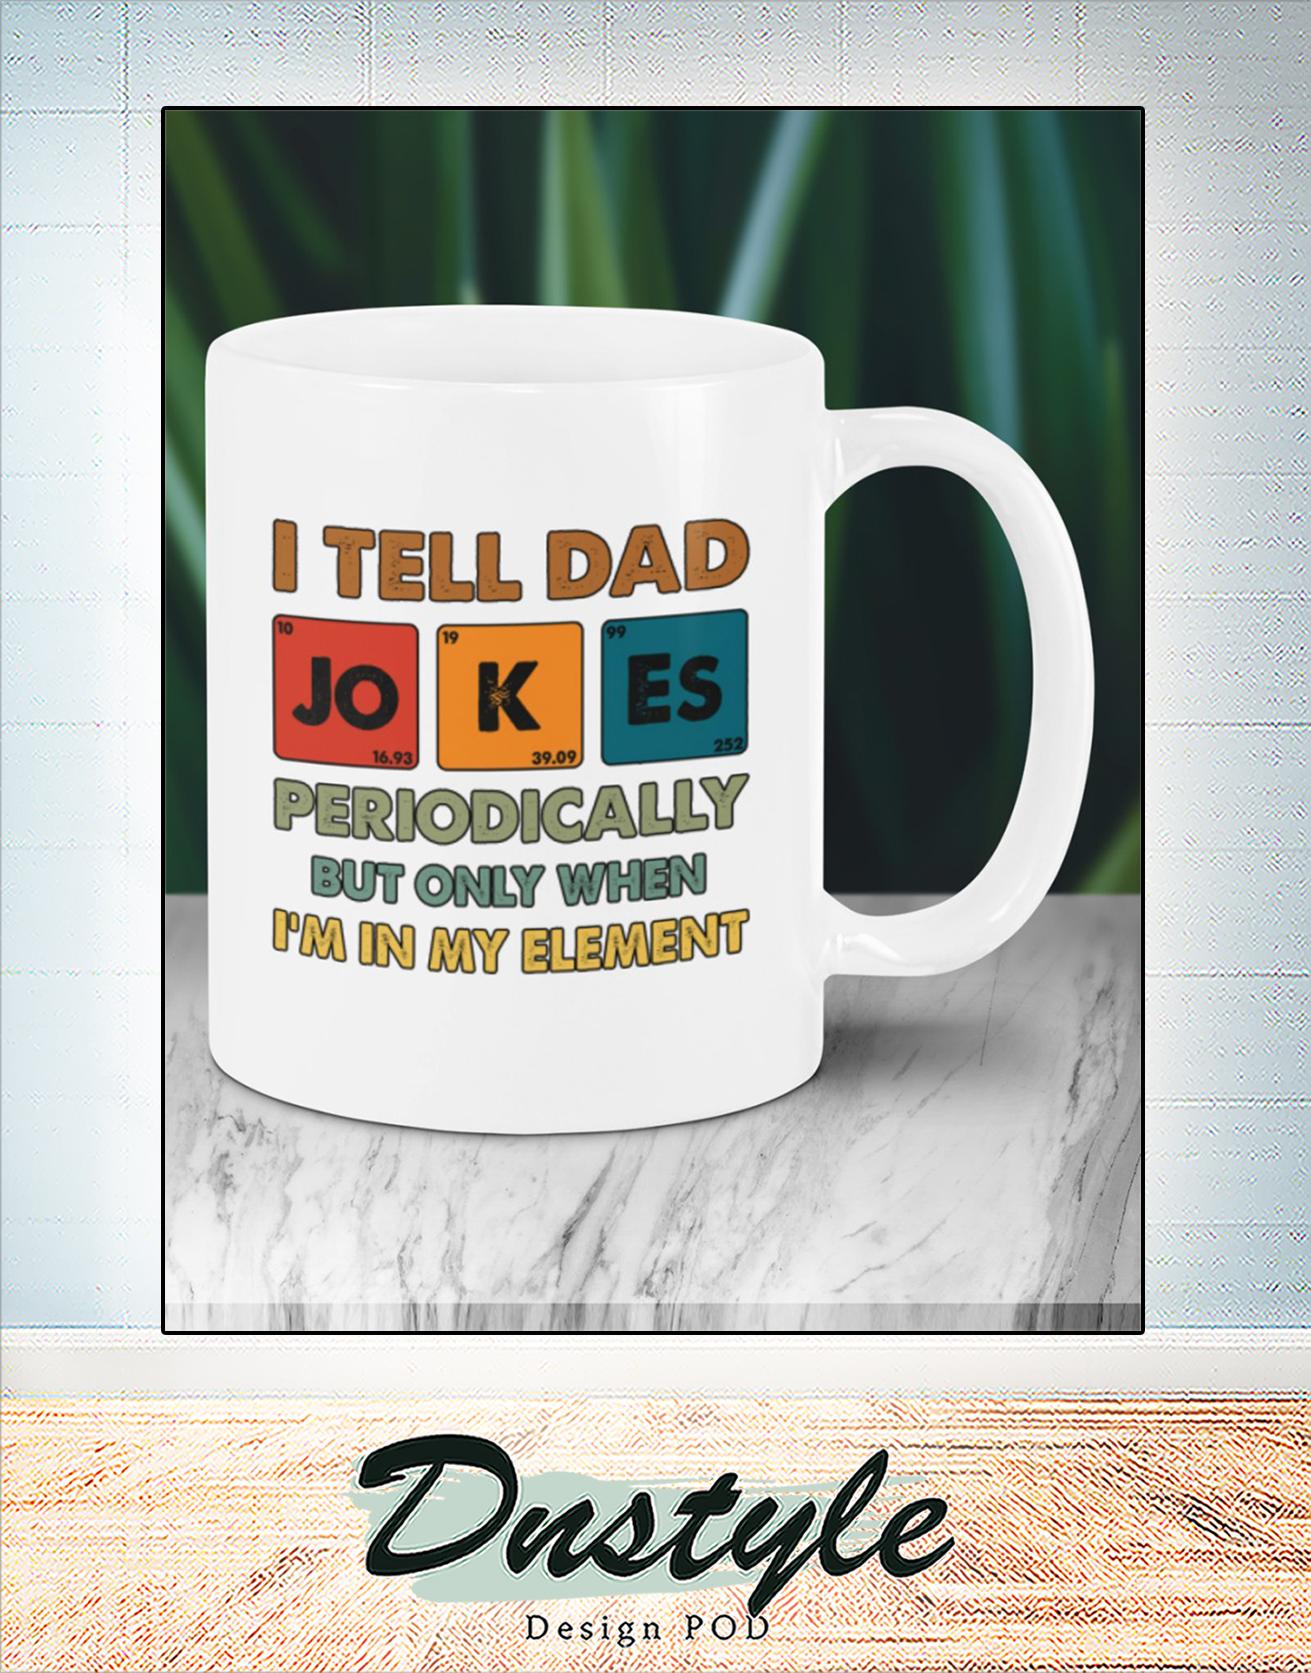 I tell dad jokes periodically mug 2